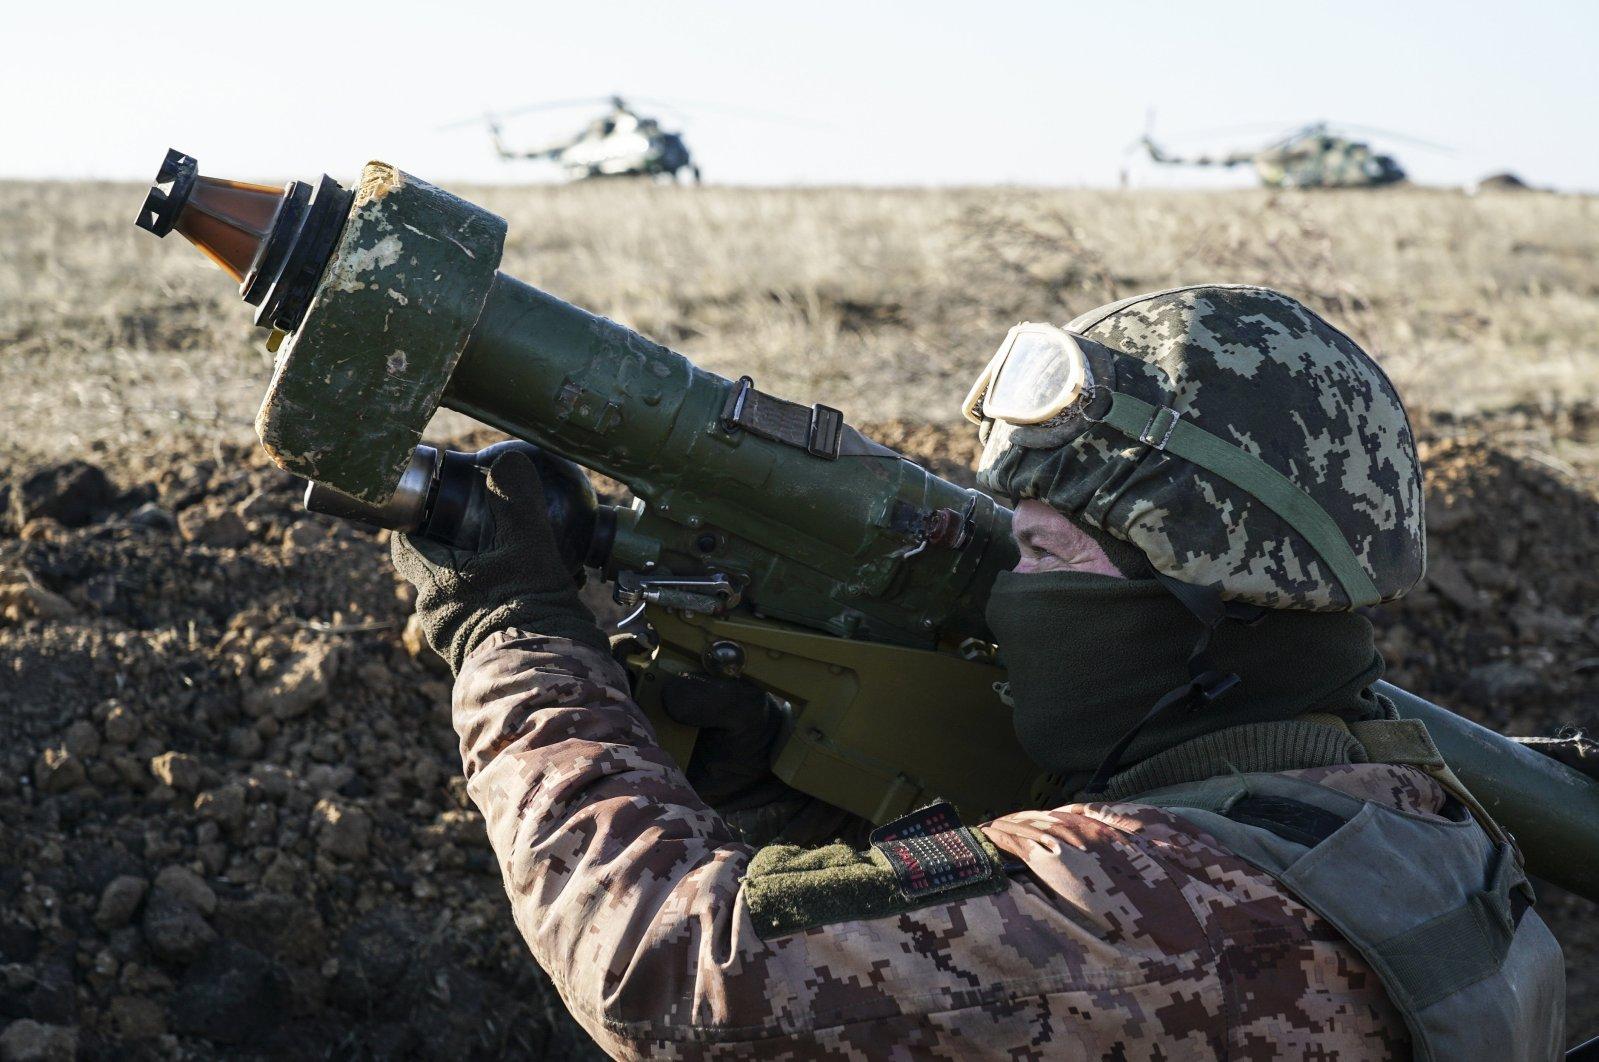 A Ukrainian soldier aims with an anti-aircraft rocker launcher during military exercises near Urzuf, south coast of Azov sea, eastern Ukraine, Nov. 29, 2018. (AP Photo)